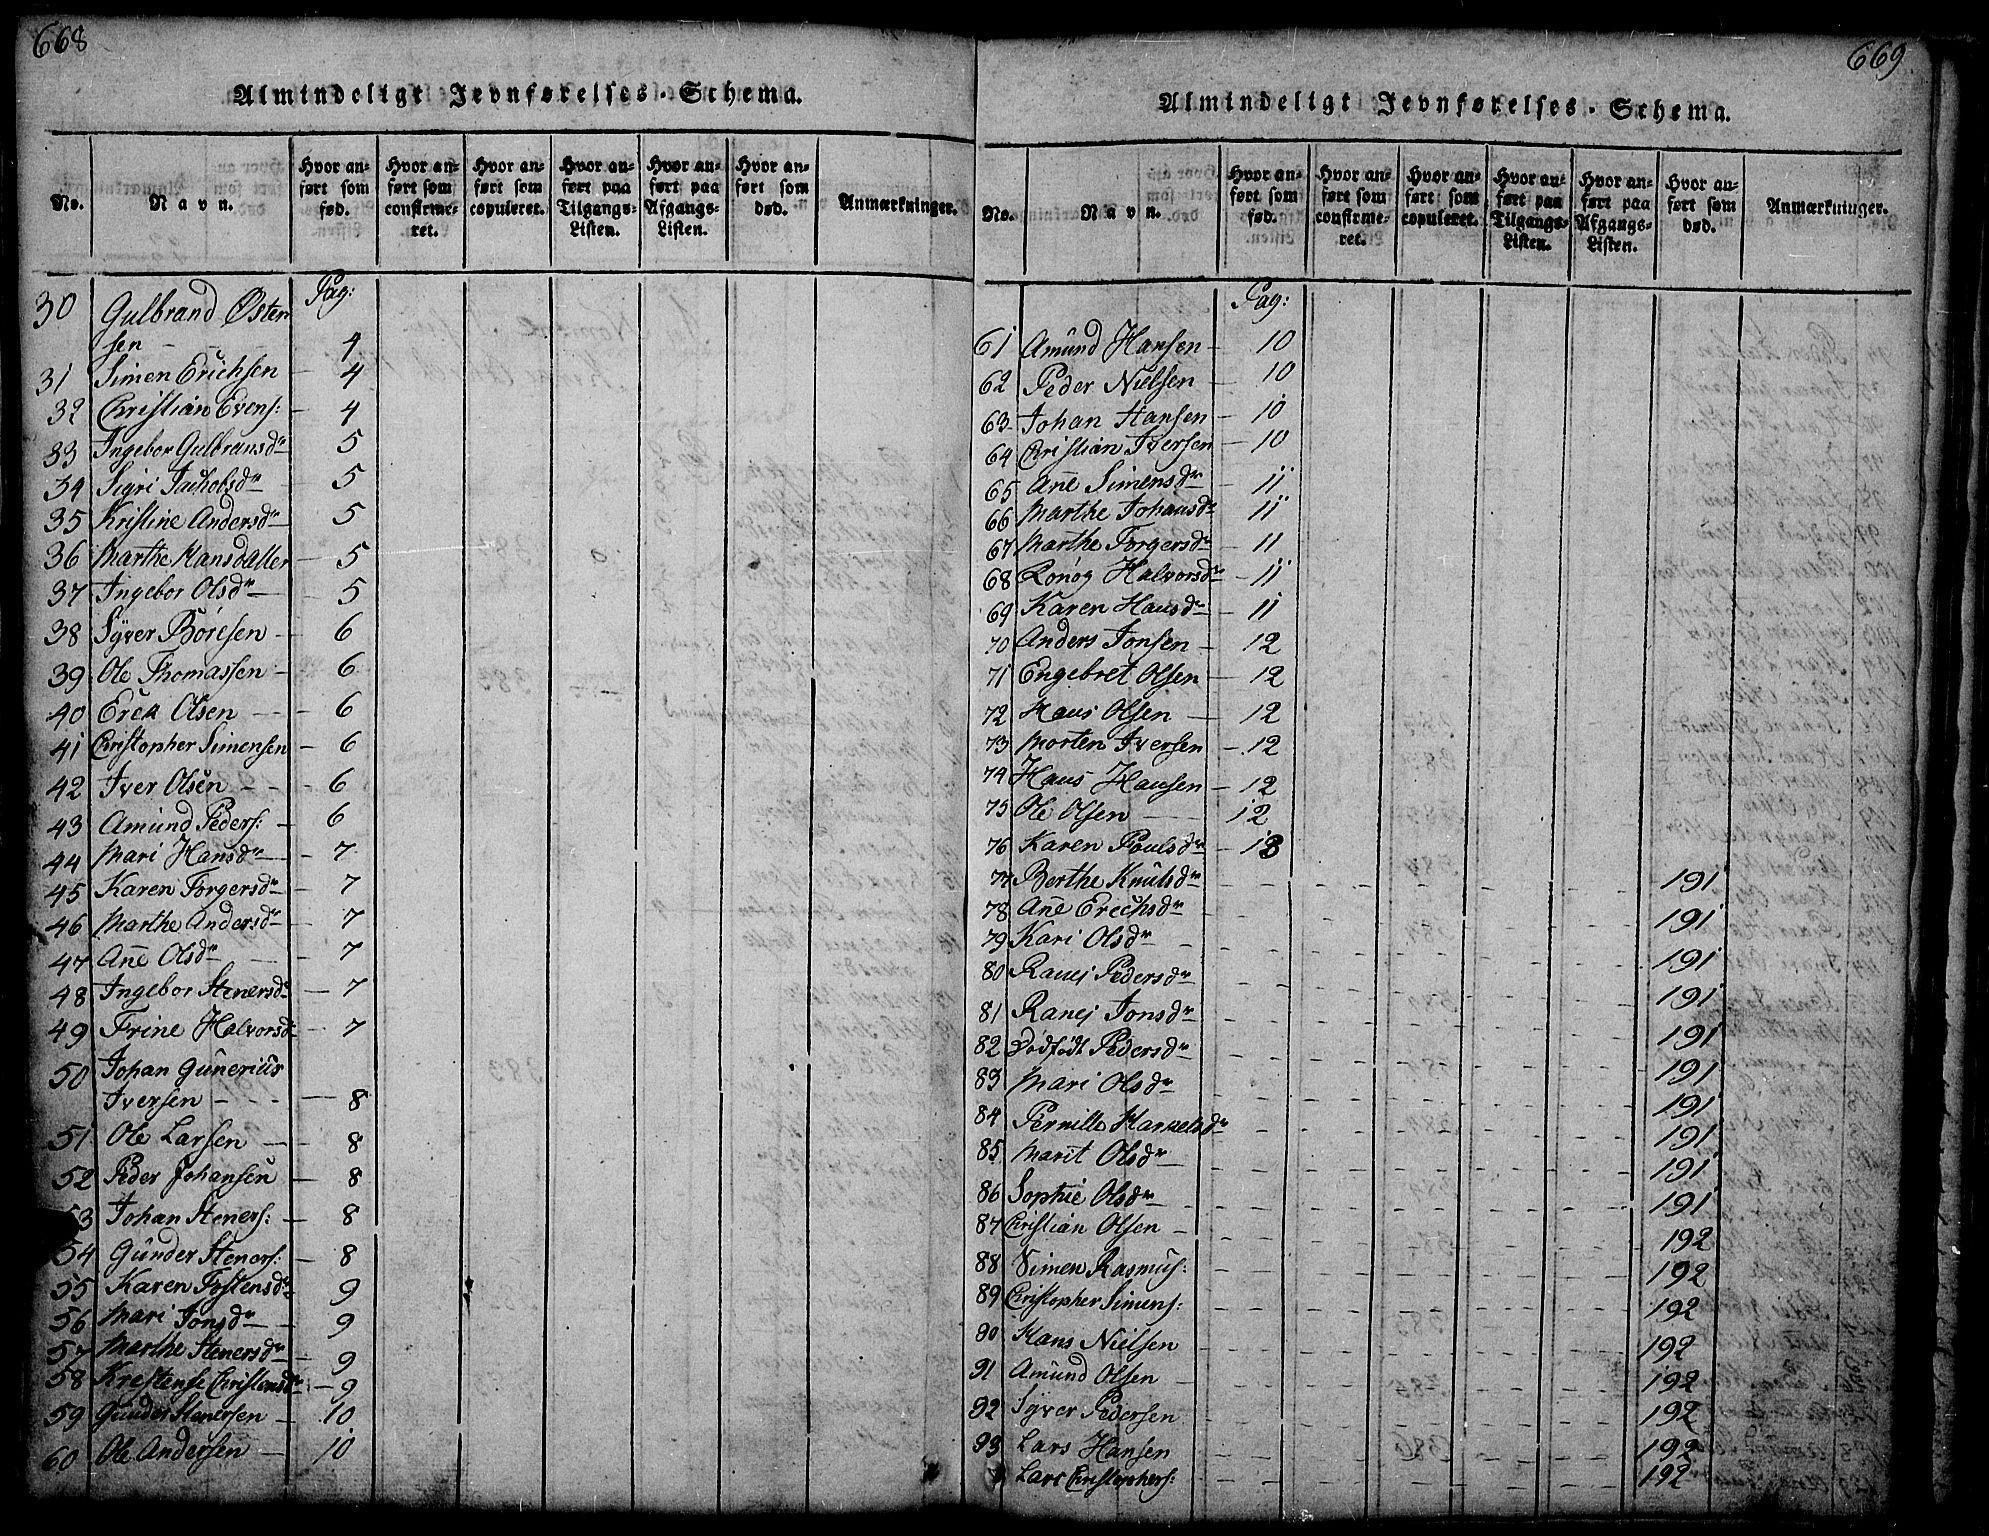 SAH, Gausdal prestekontor, Parish register (copy) no. 1, 1817-1848, p. 668-669